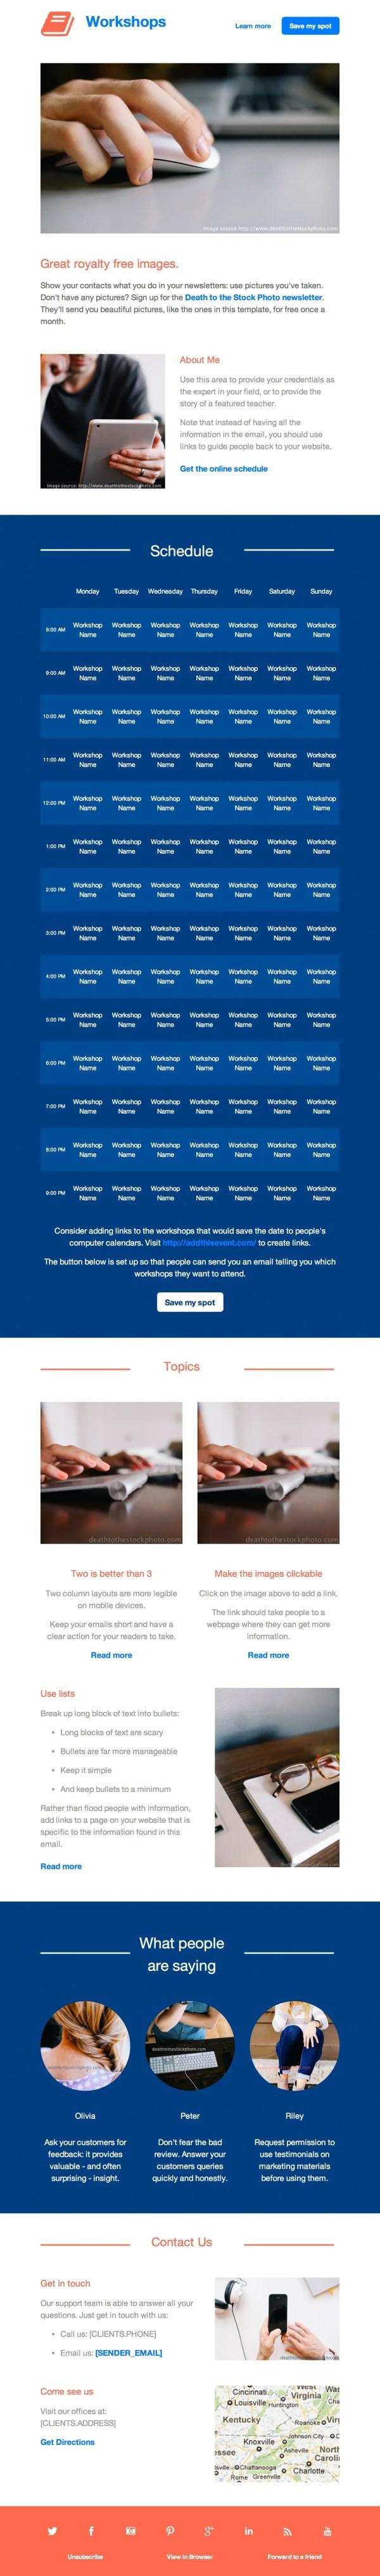 Workshops Email Newsletter Template